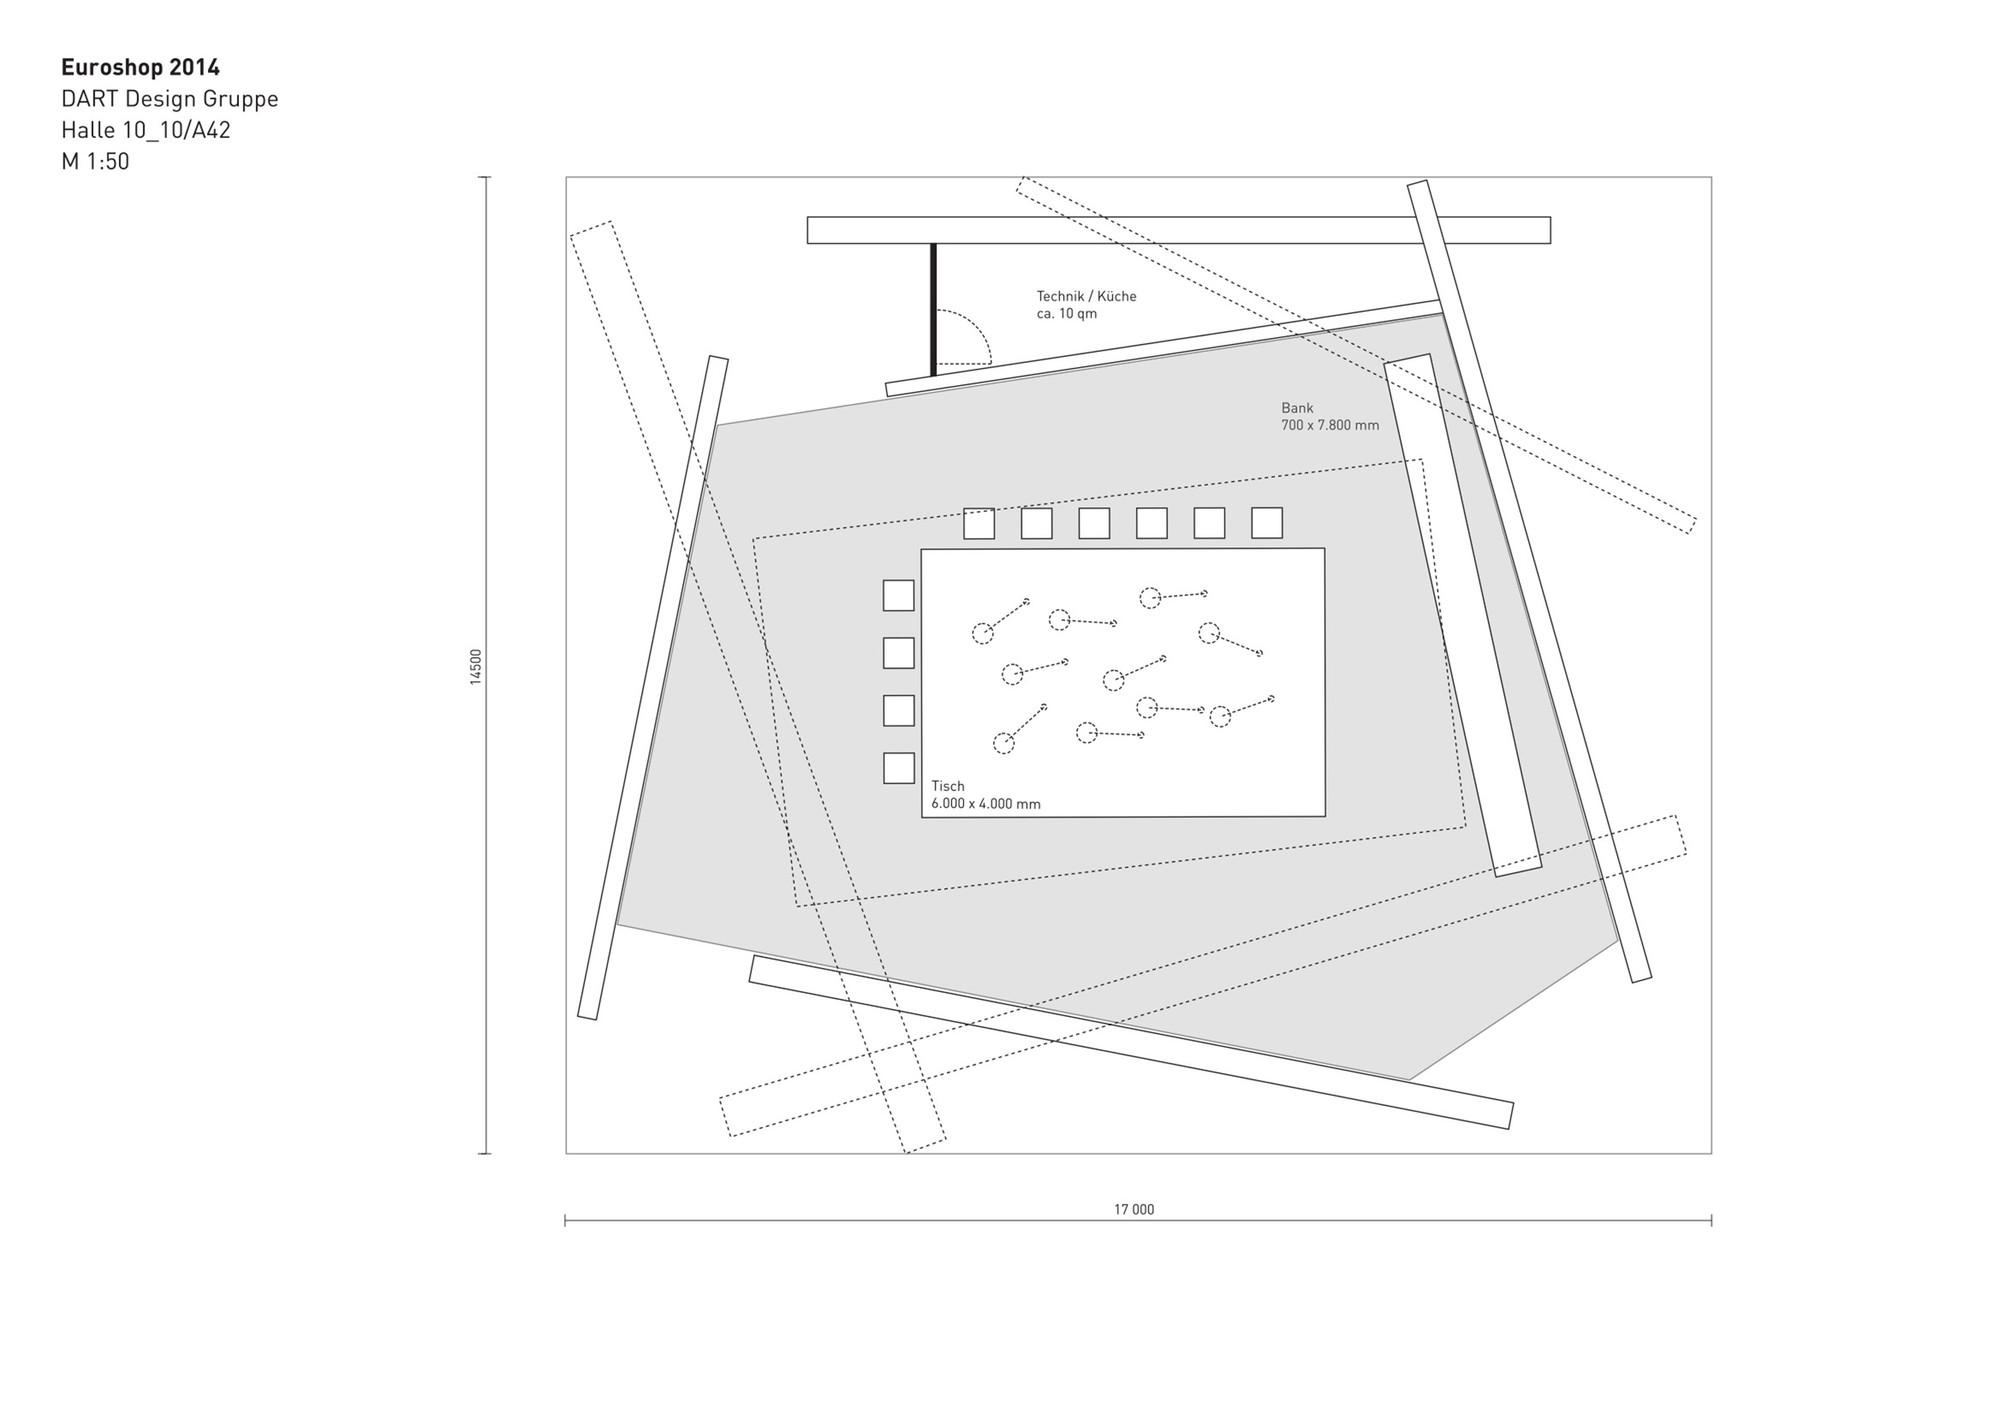 Gallery Of Euroshop 2014 Stand D Art Design Gruppe 10